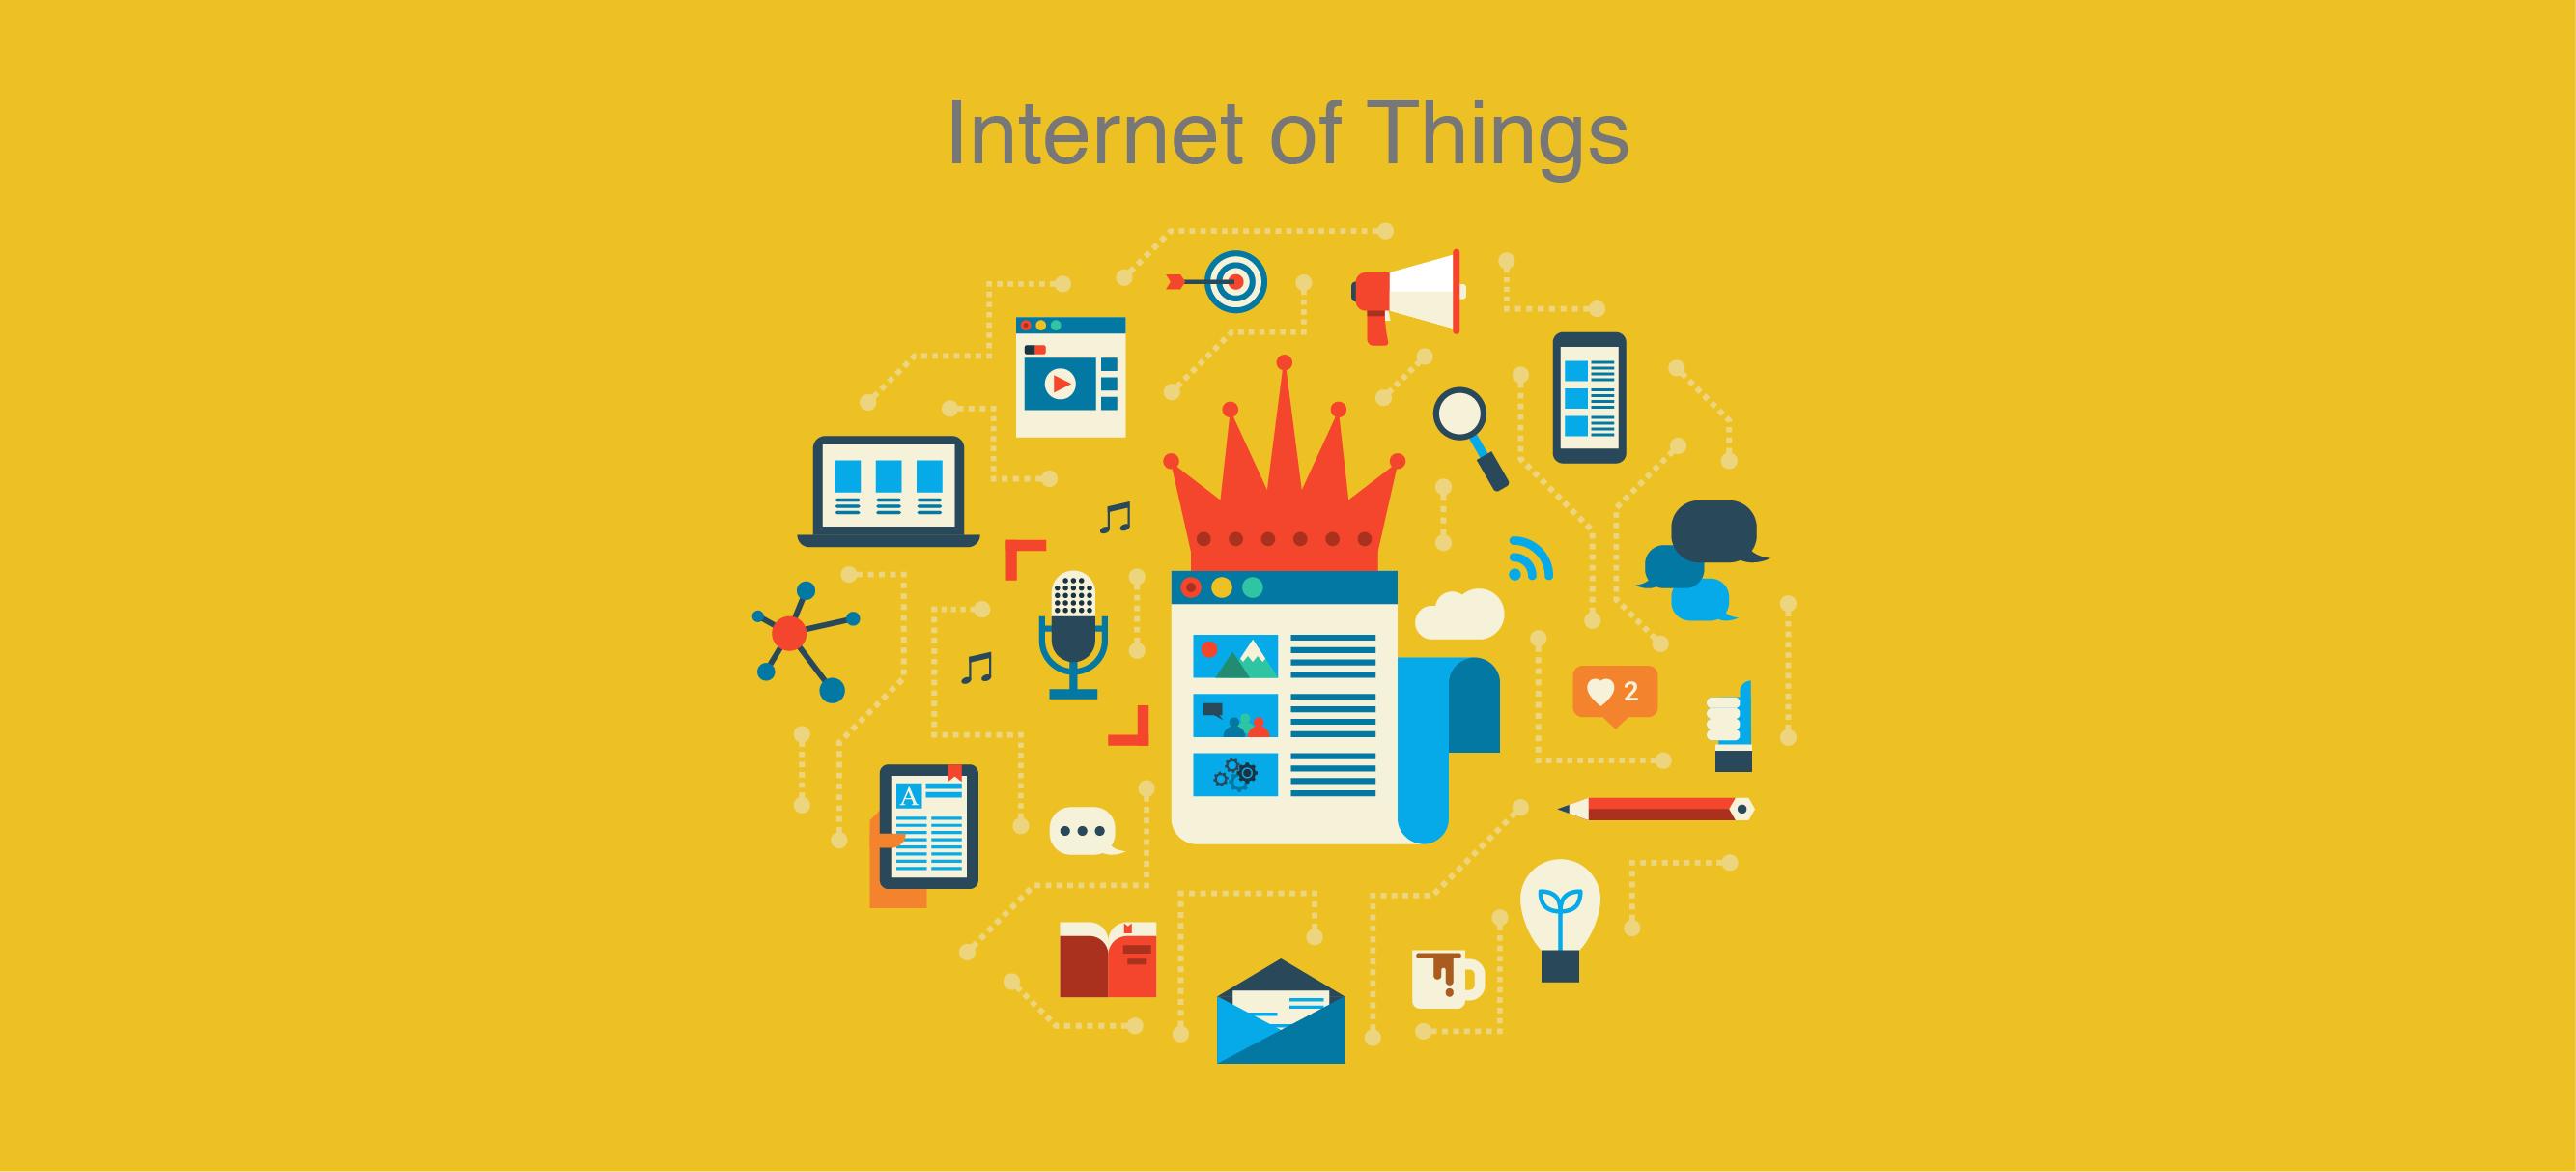 IoT Master Data Management part 2